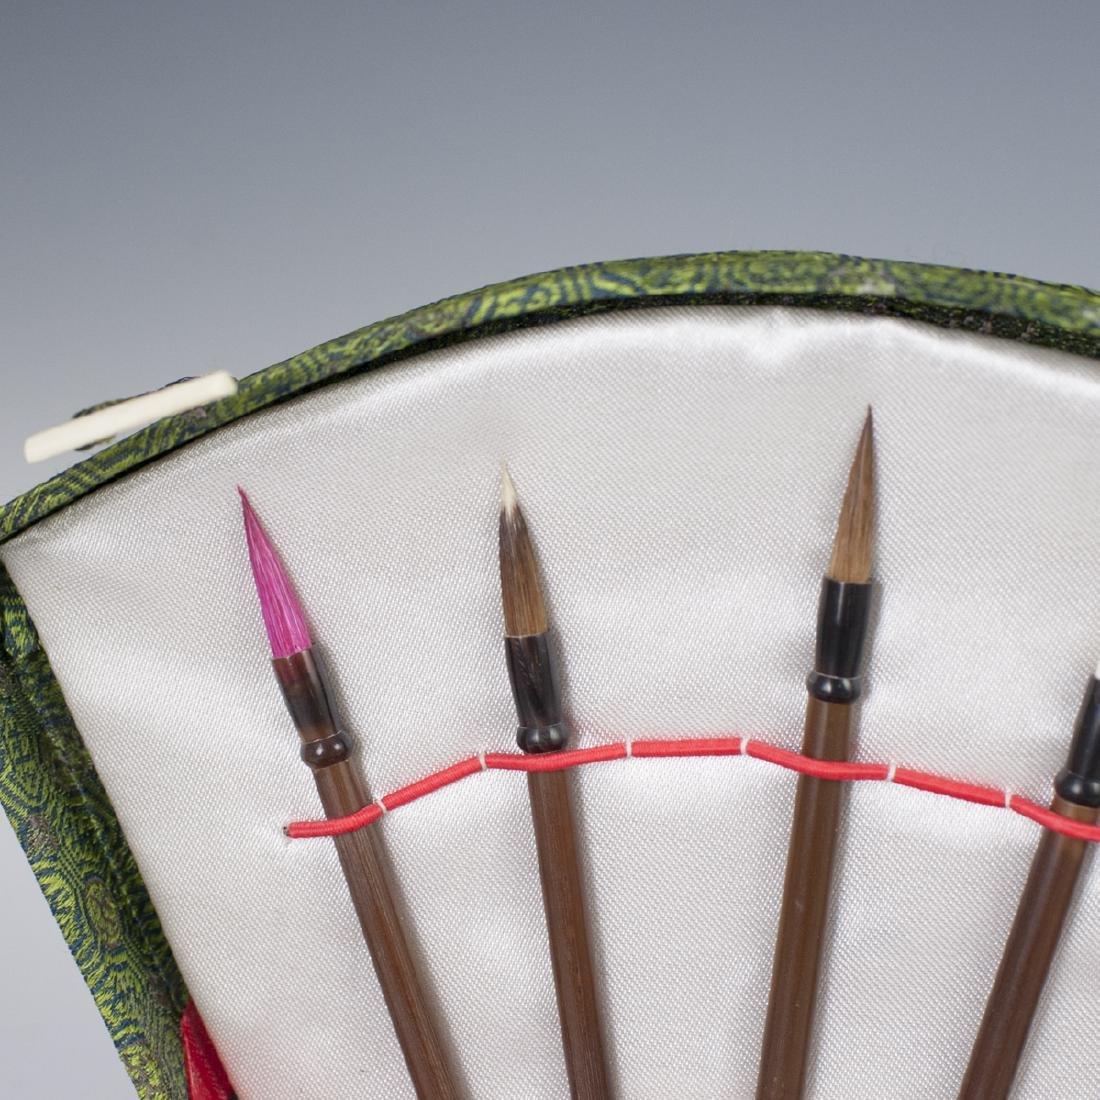 Chinese Calligraphy Artist Set - 3